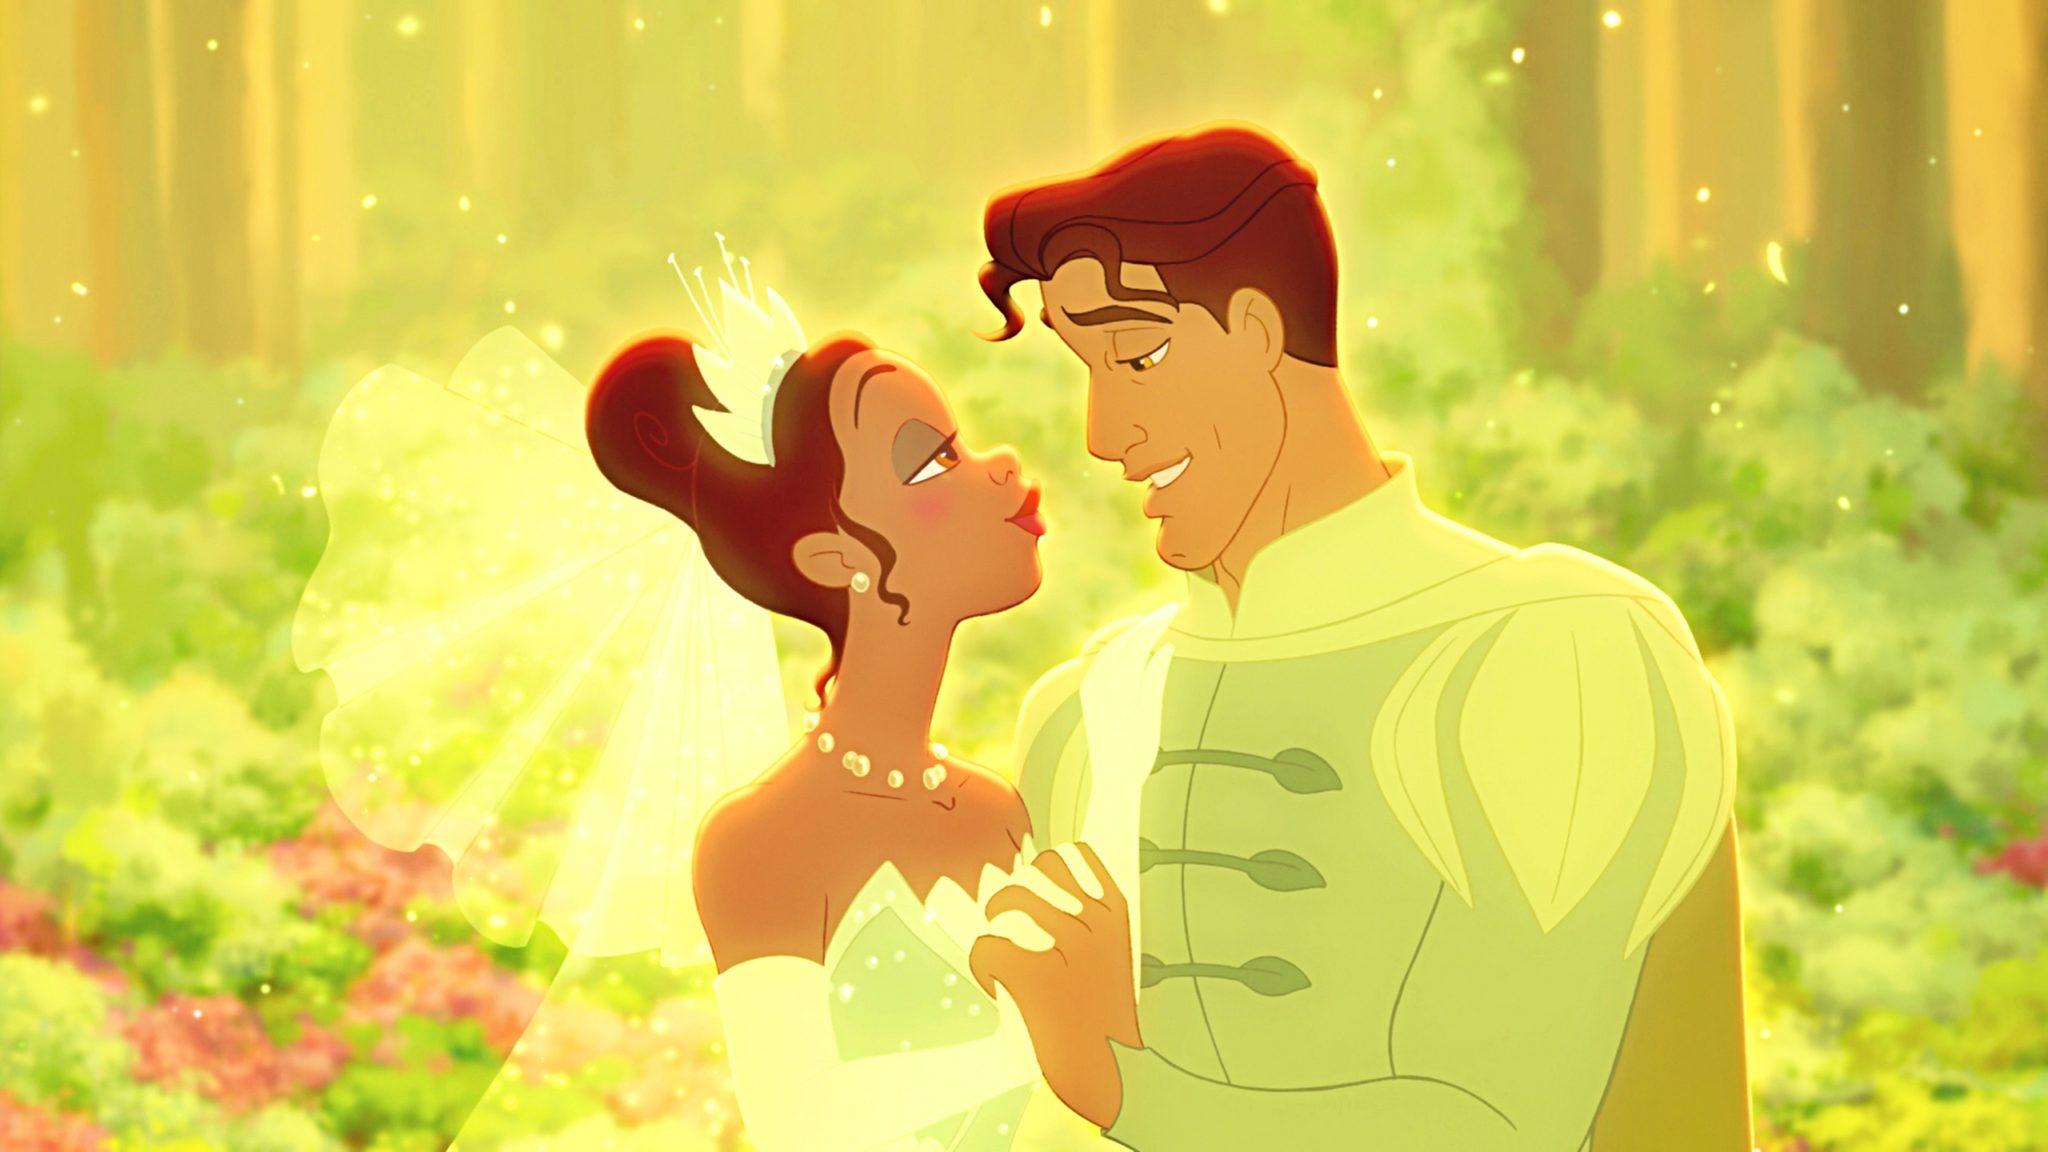 Walt-Disney-Screencaps-Princess-Tiana-Prince-Naveen-walt-disney-characters-31917898-2560-1440